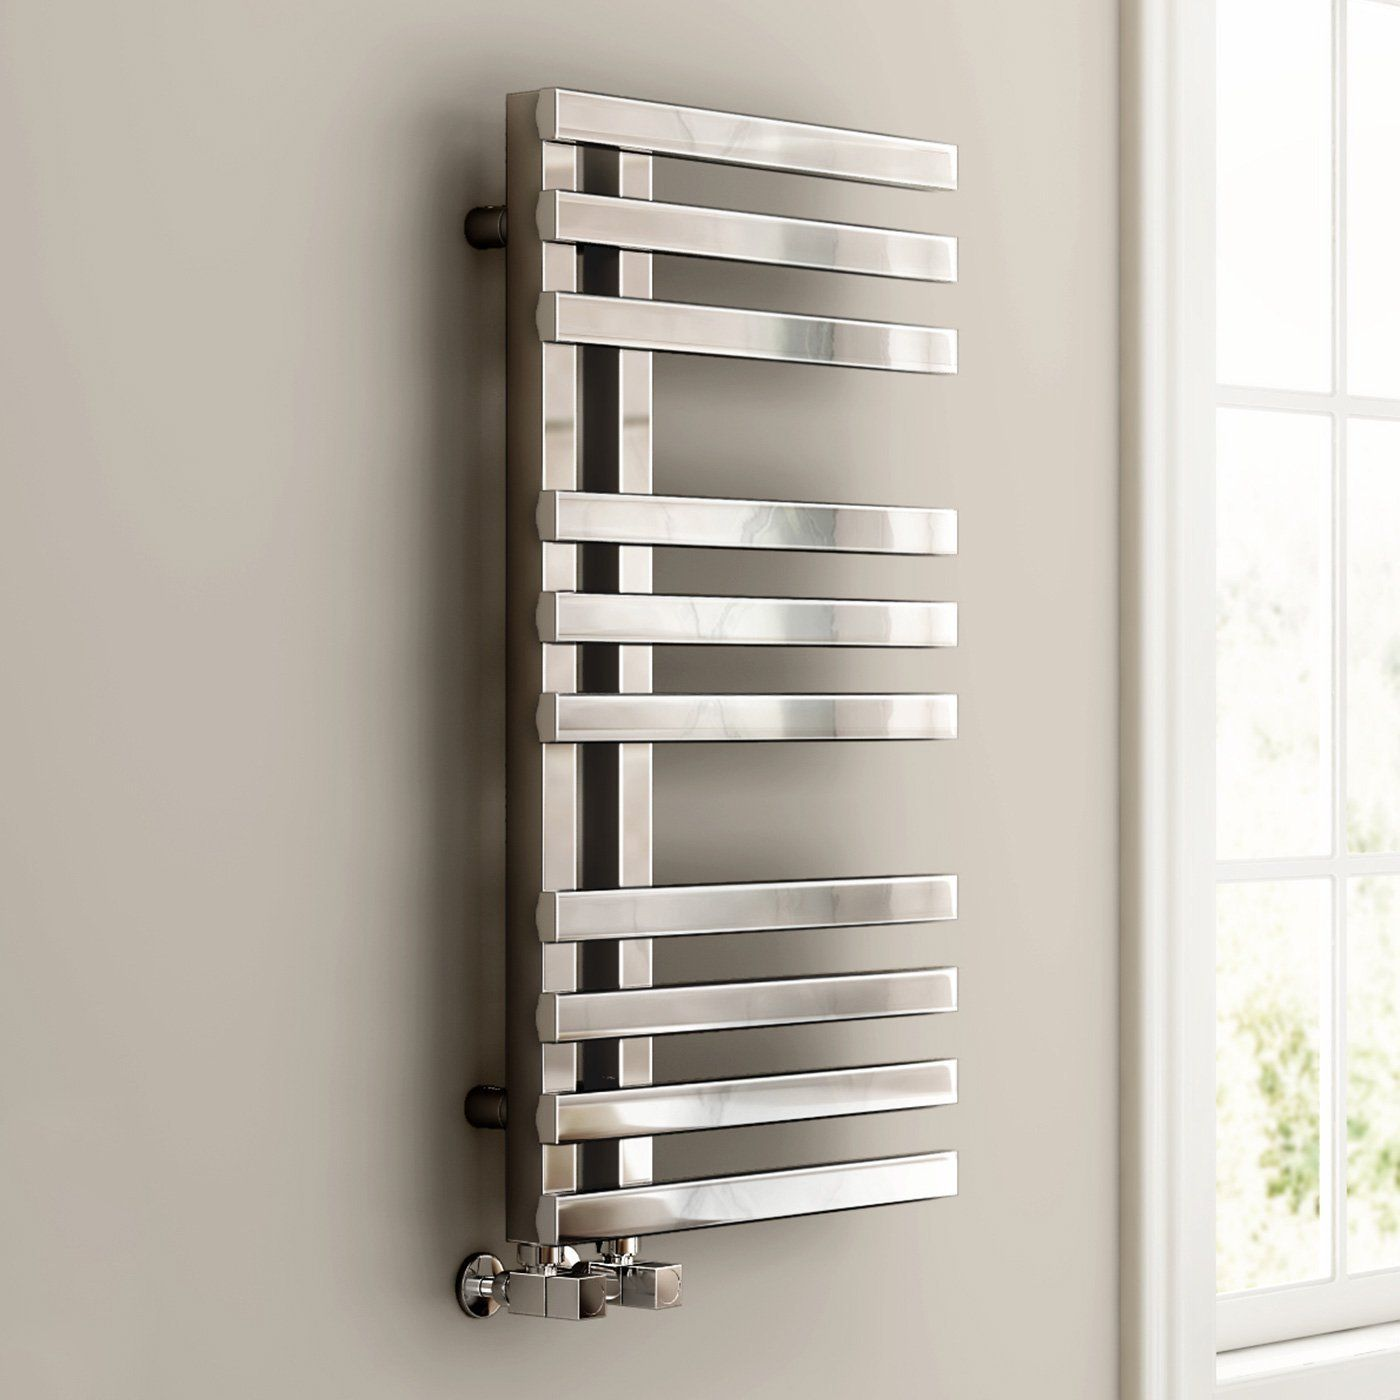 820 X 450 Designer Square Chrome Heated Towel Rail Bathroom